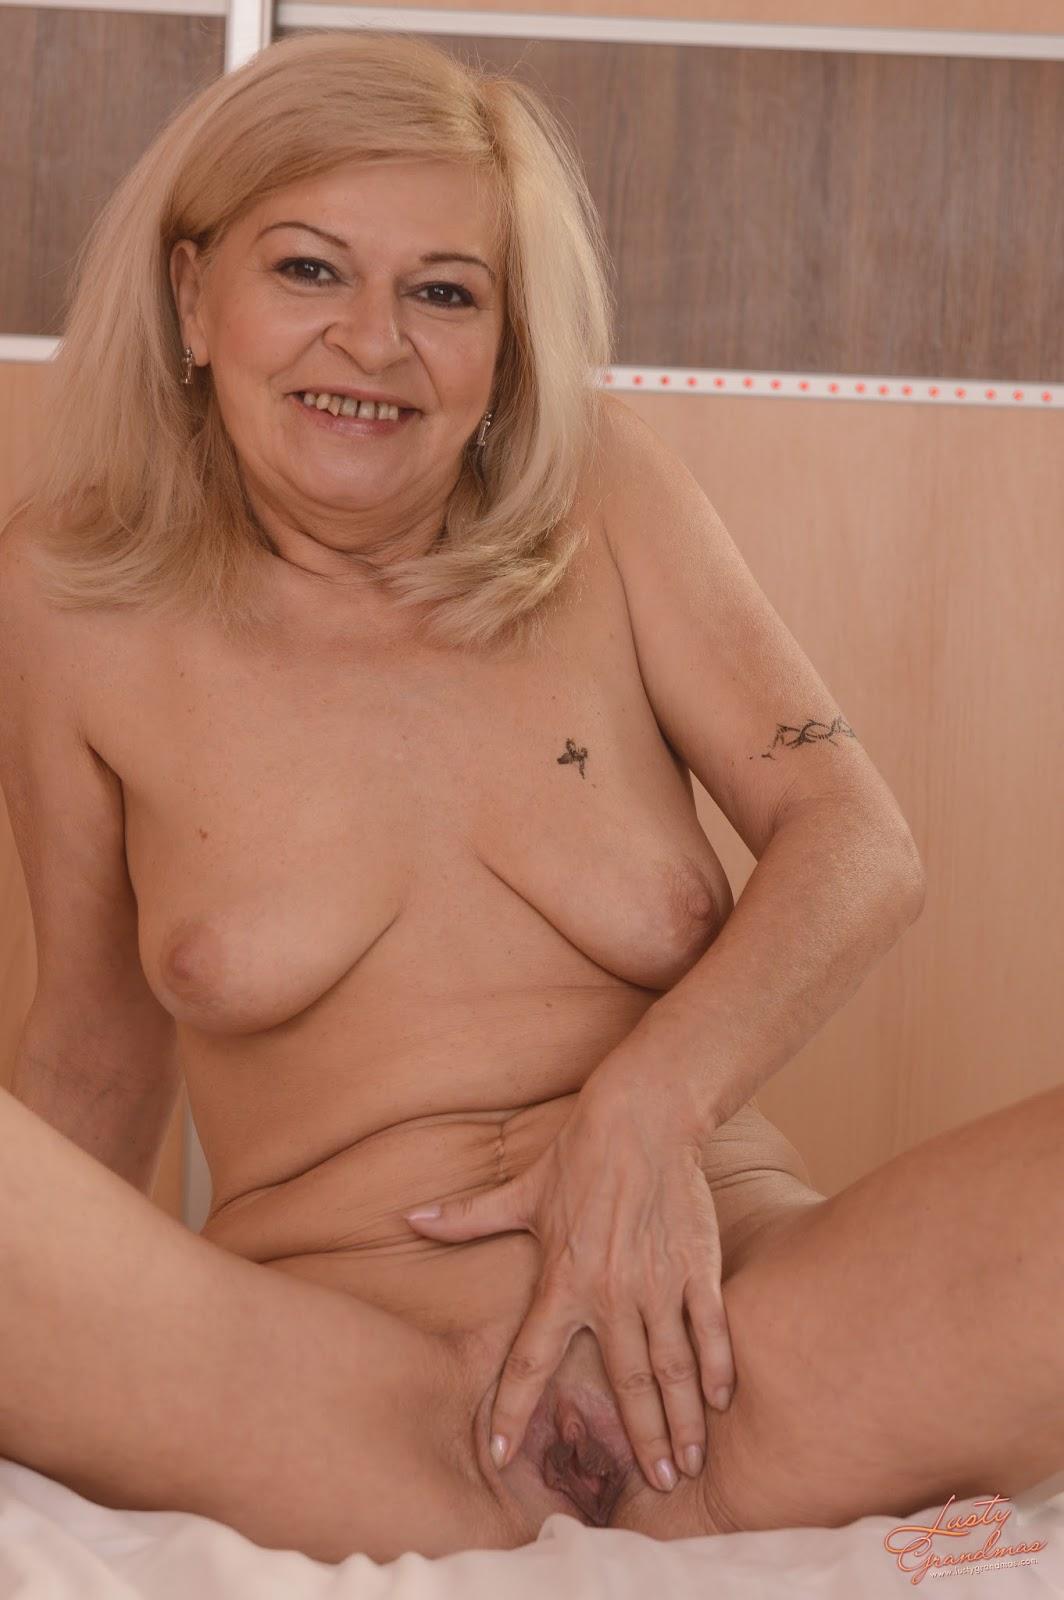 rachael ray fake nude photes